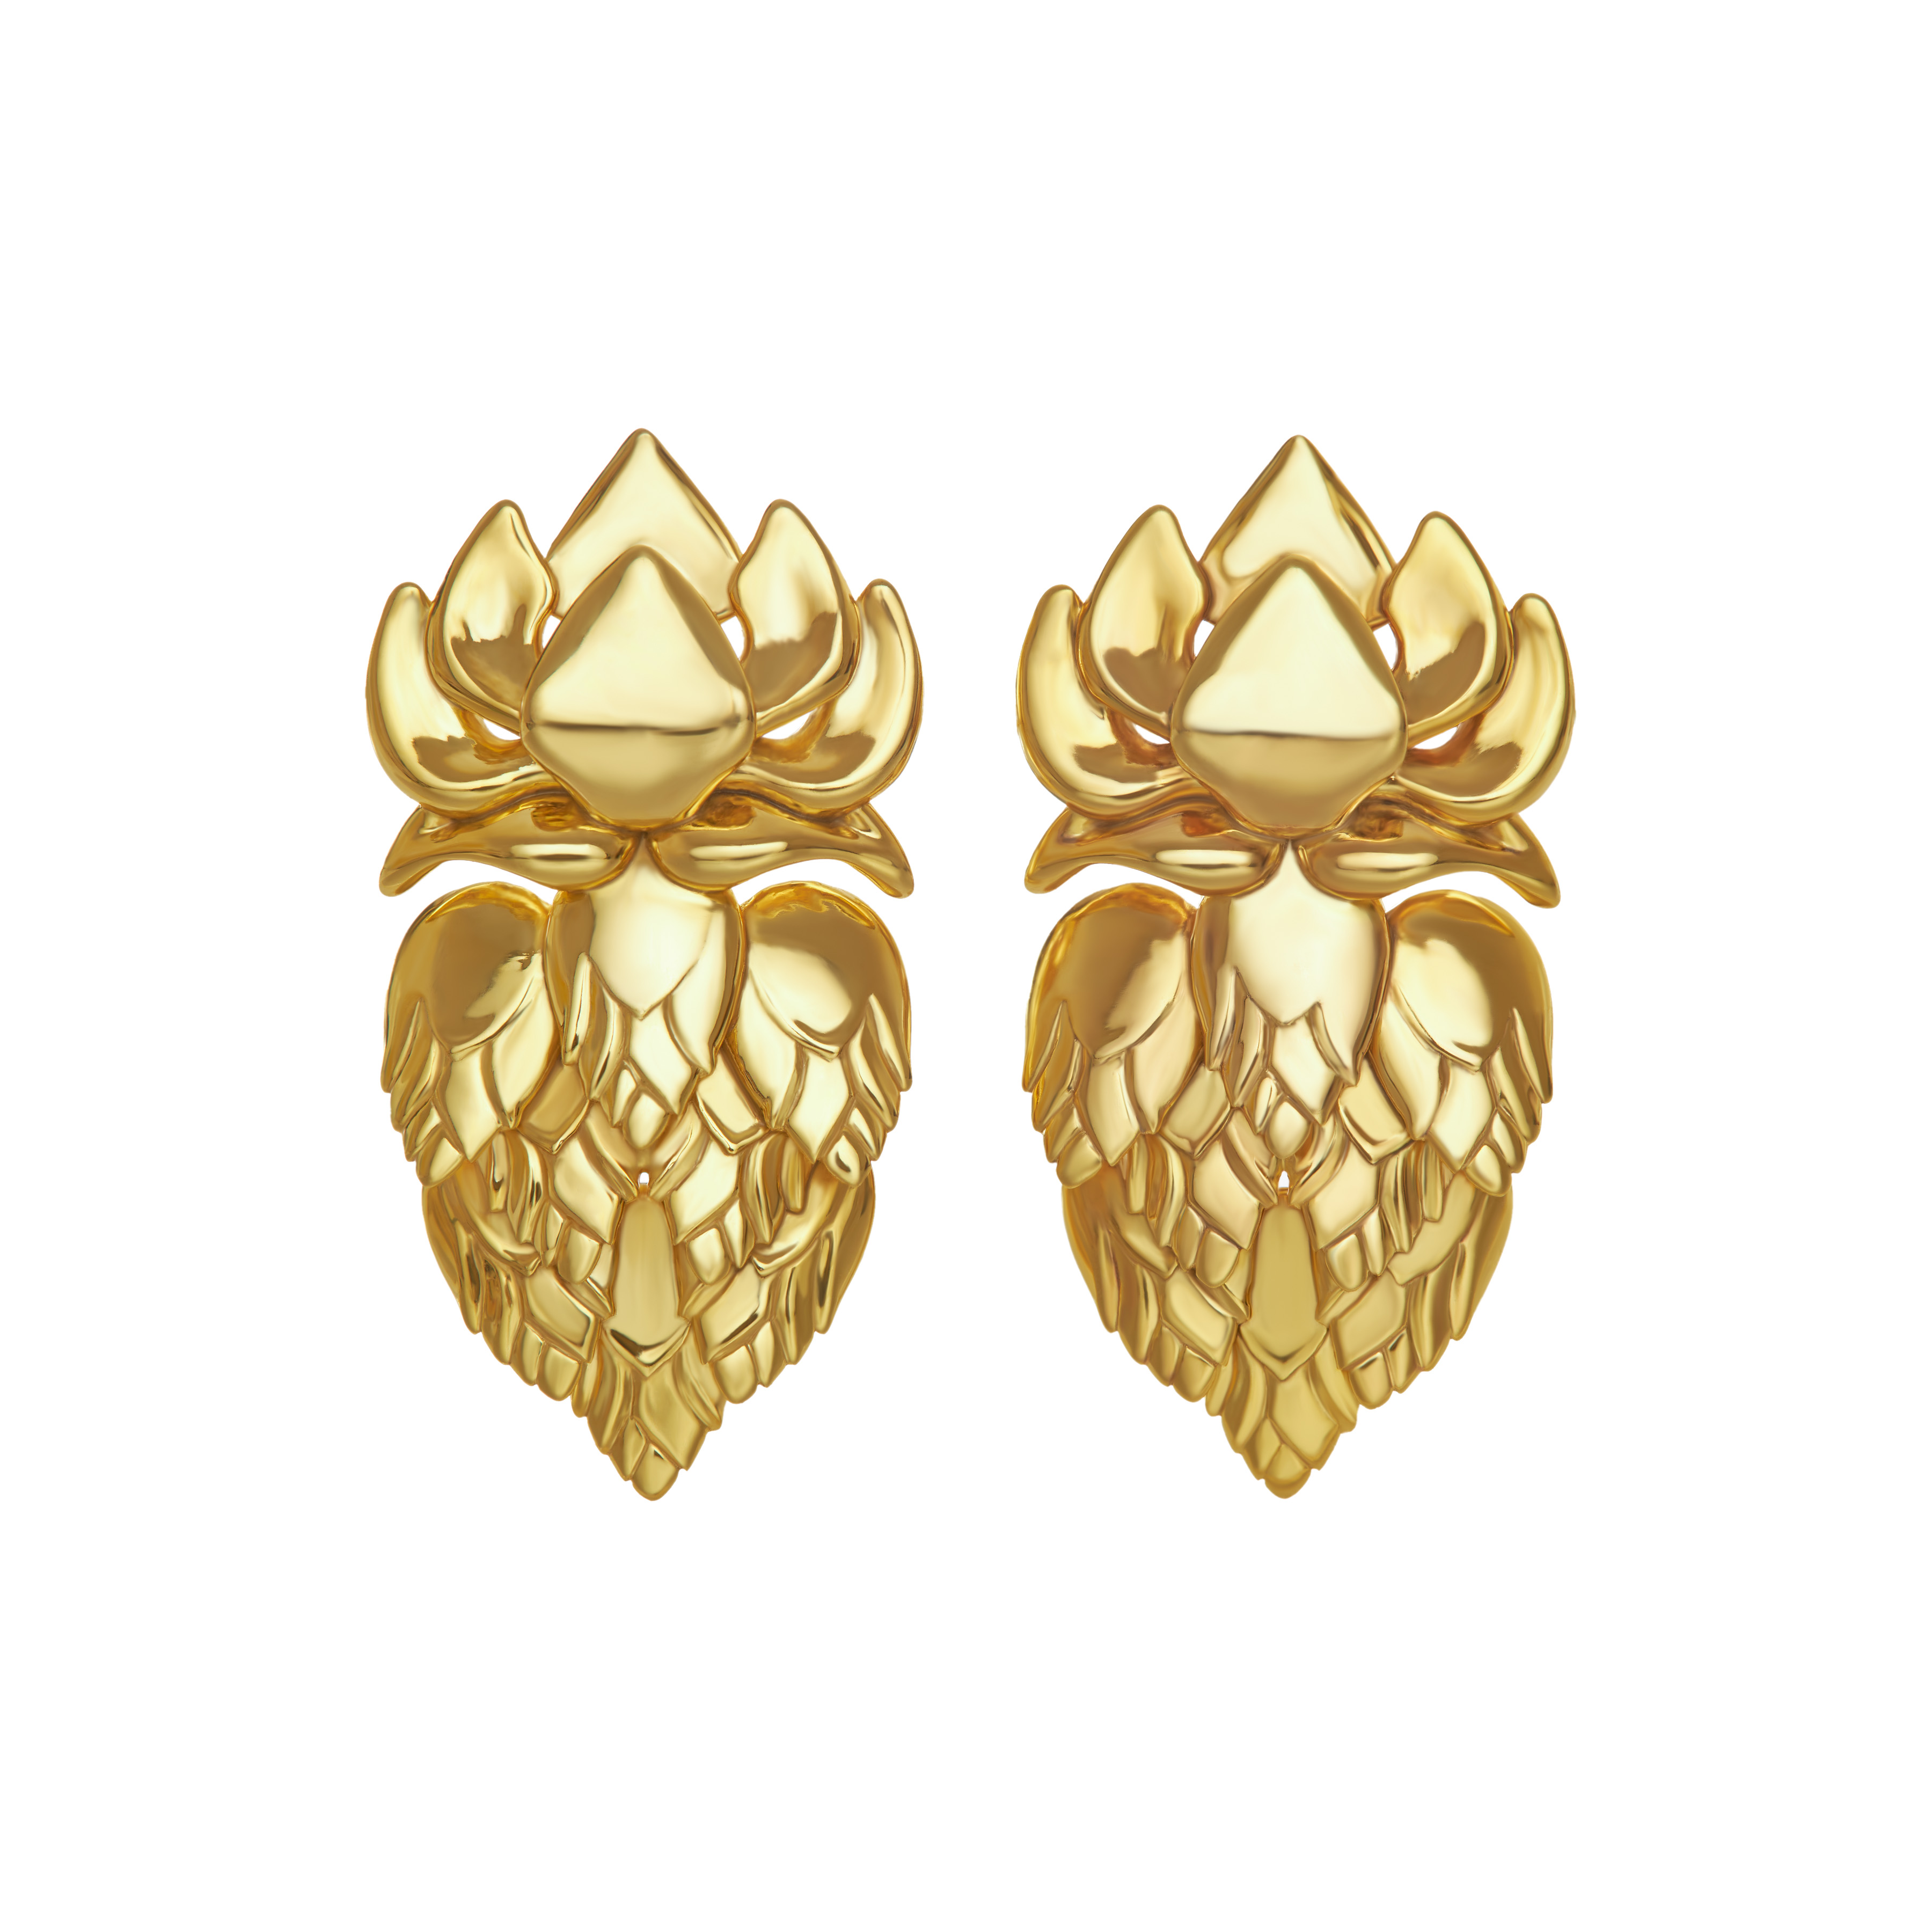 Phkachhouck 1.0 Earrings in 18kt Yellow Gold, Image Courtesy of EdoEyen